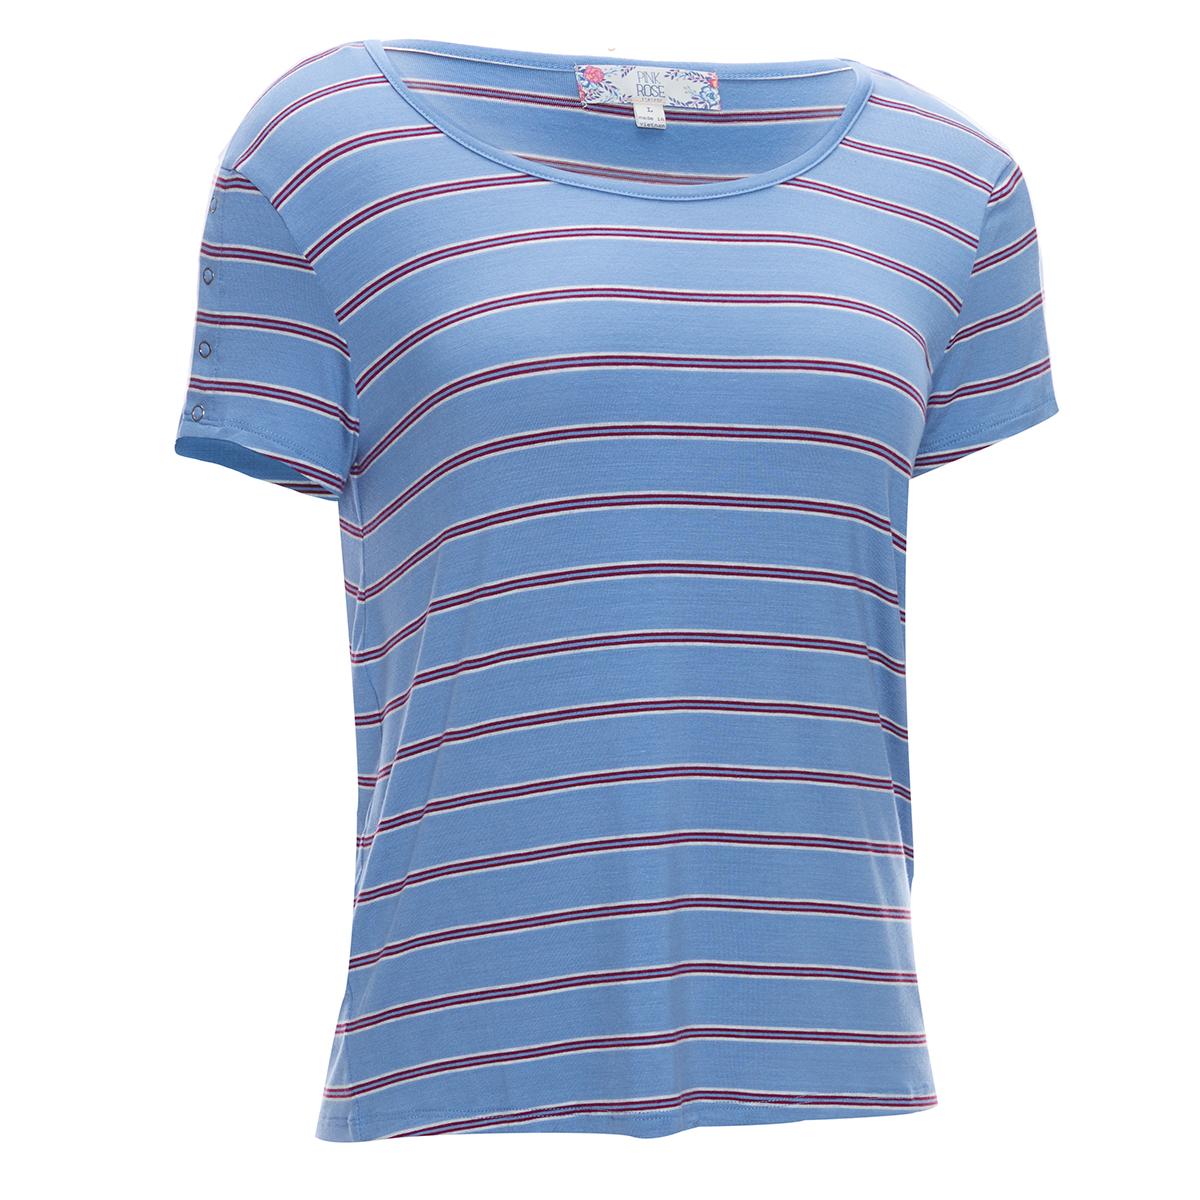 Pink Rose Juniors' Short-Sleeve Rayon Stripe Scoop Neck Snap Trim Jersey Tee - Blue, M